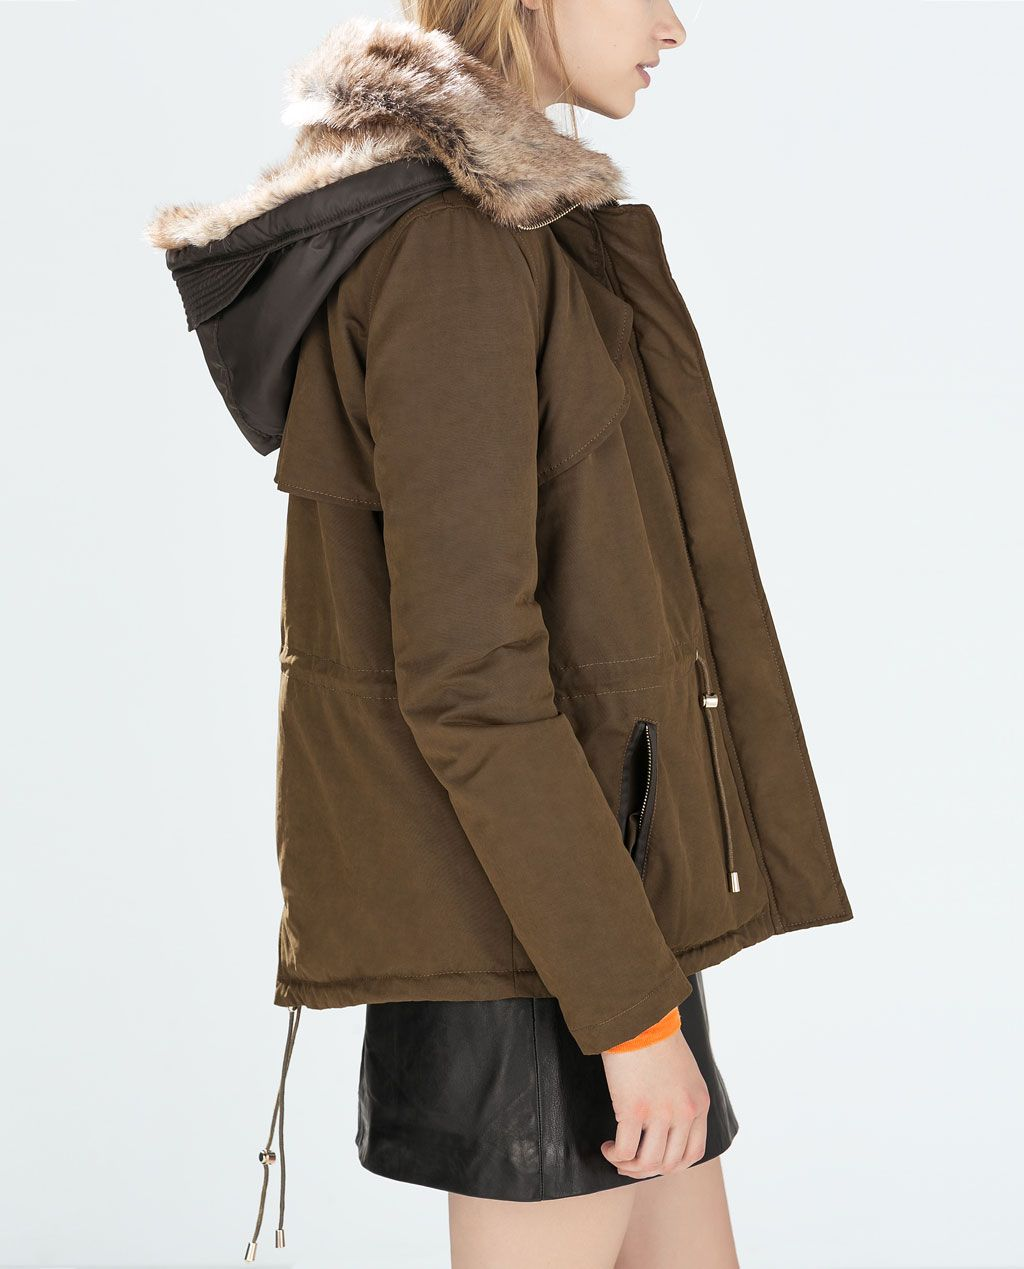 Parka Pinterest Contraste Zara Mujeres Shopping Trf Zara OcTa1fxw1q